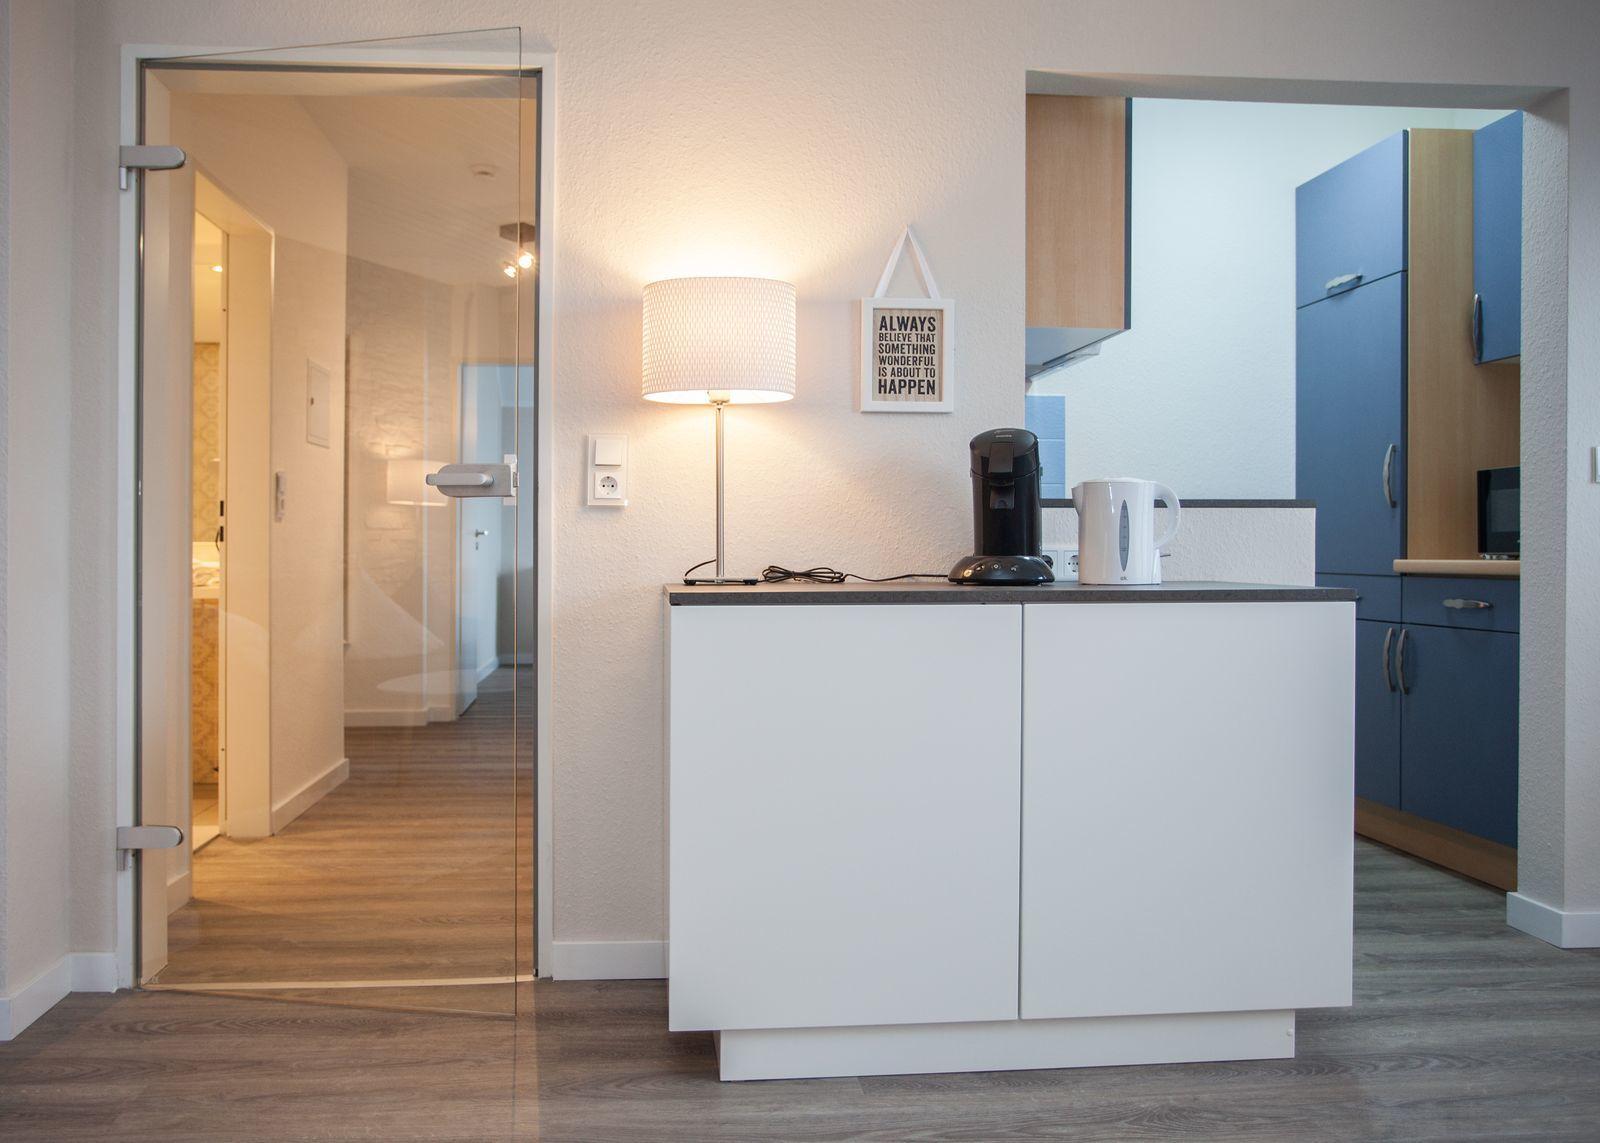 Appartement - Am Waltenberg 57-I | Winterberg